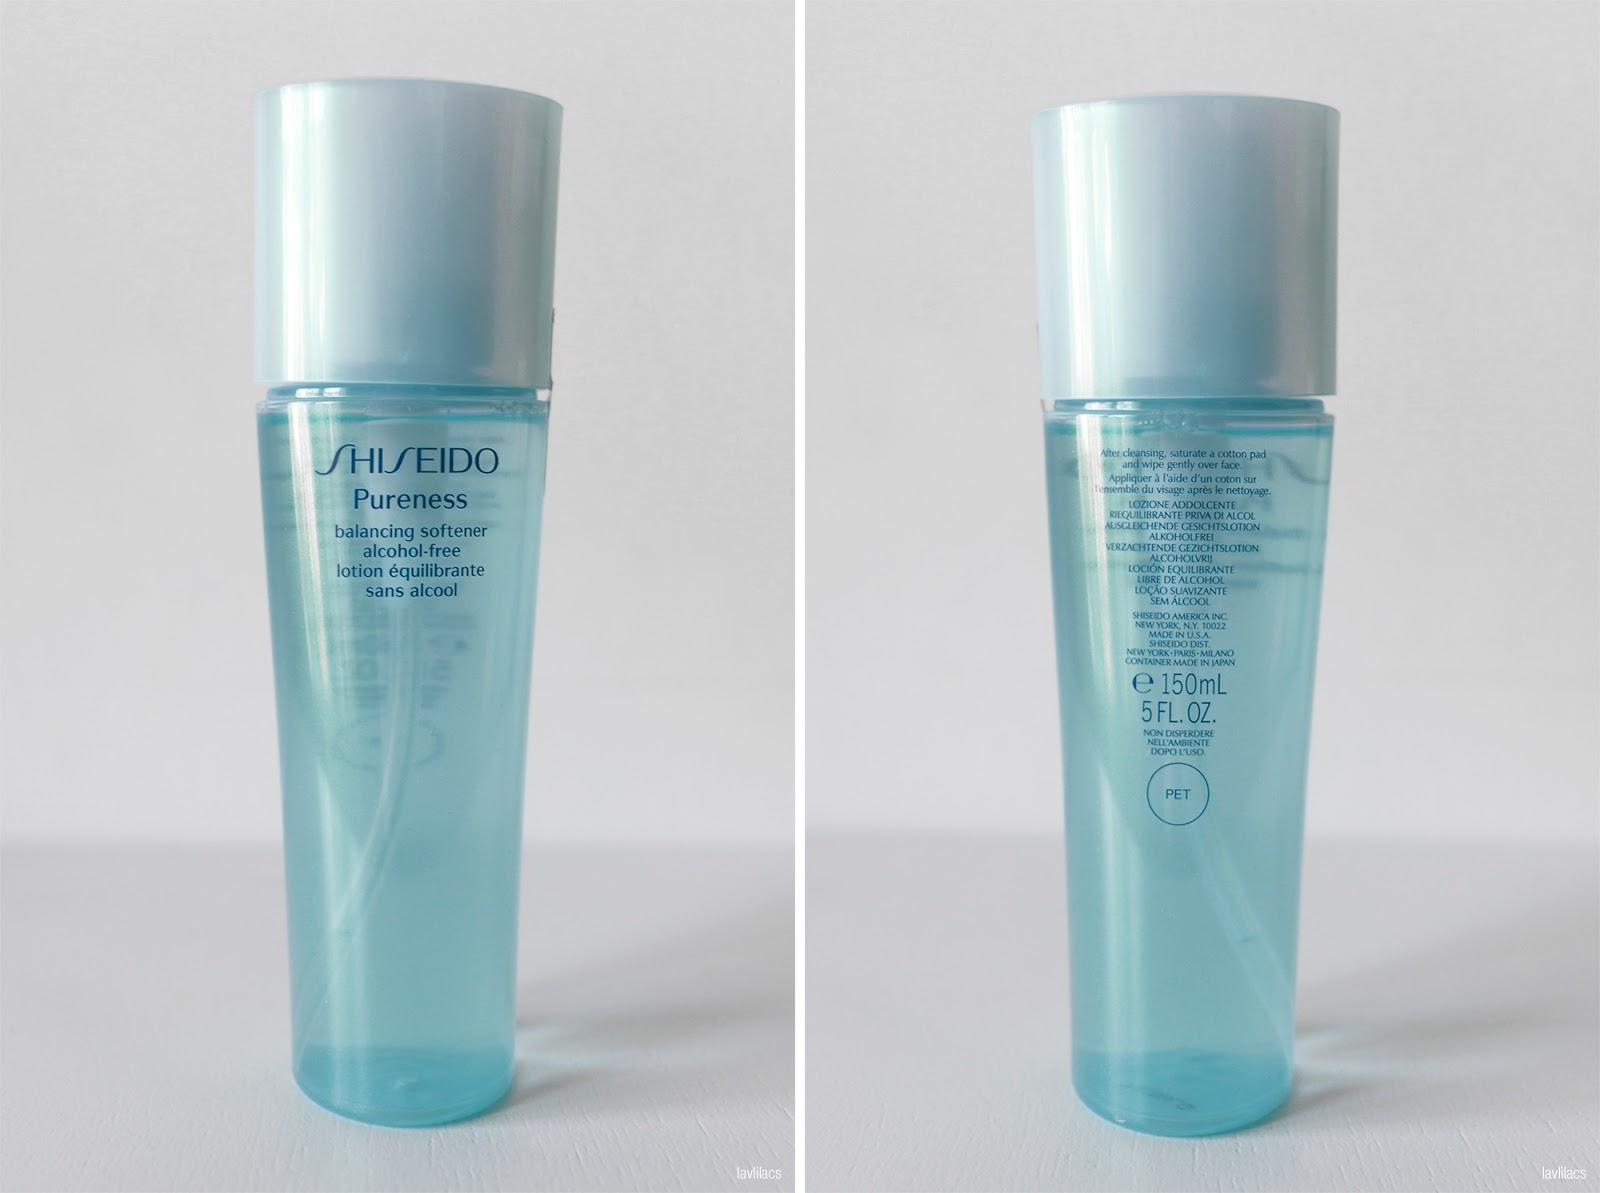 lavlilacs SHISEIDO Pureness Balancing Softener Alcohol-Free bottle